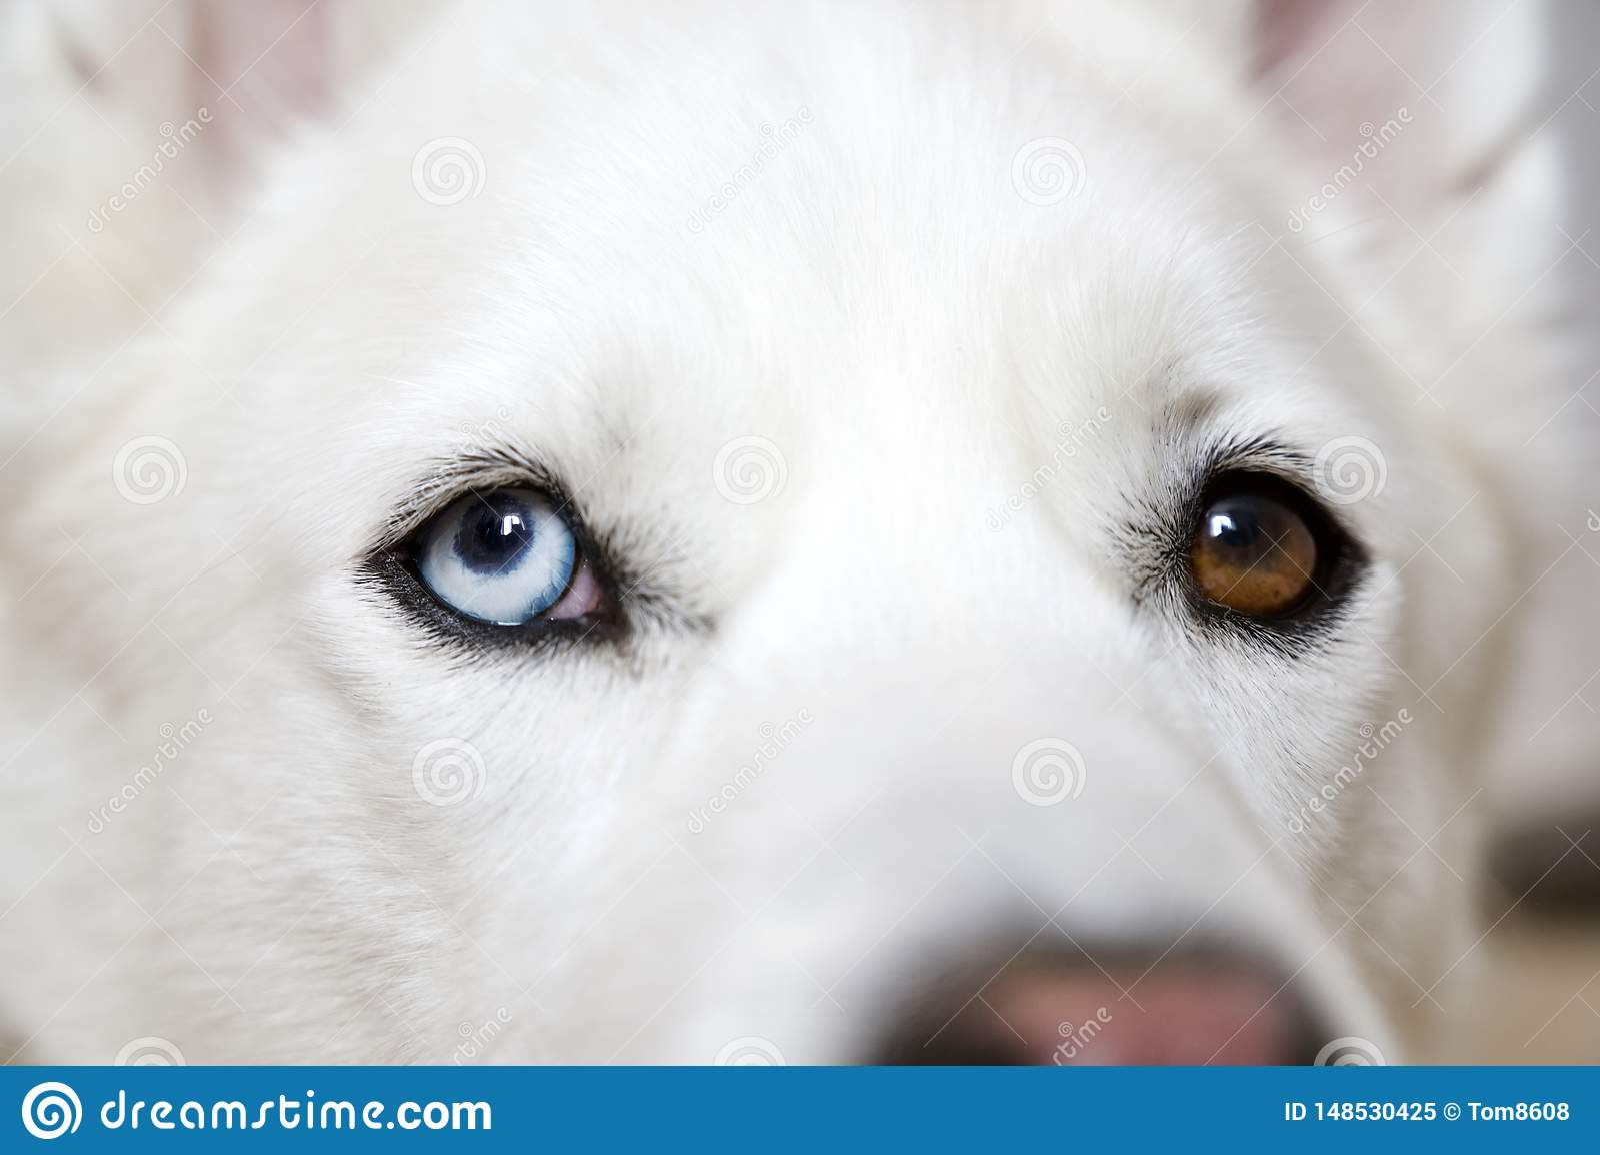 Bi-Eyed Husky Dog Close Up